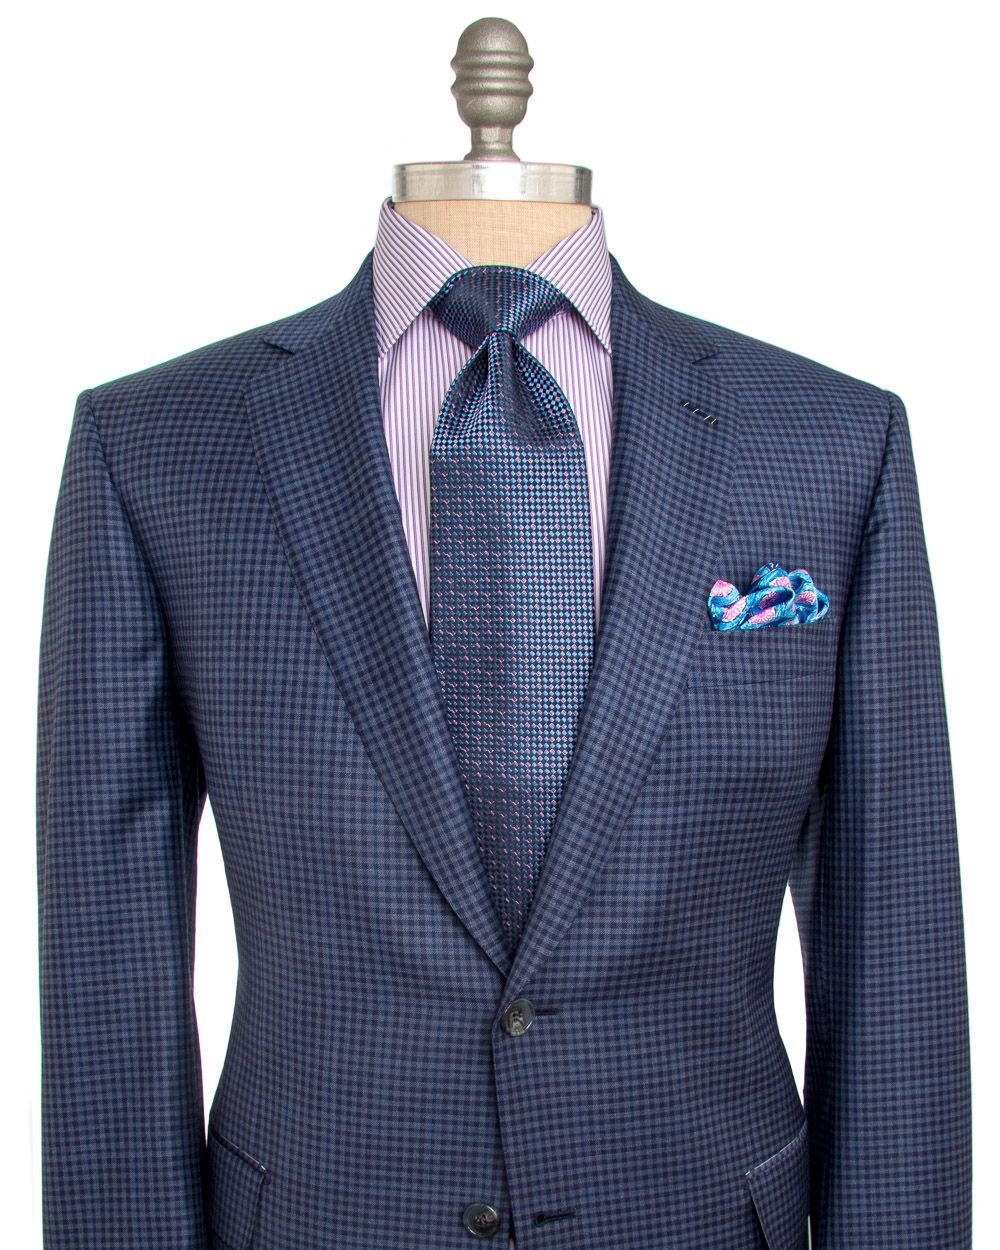 Brioni | Navy and Purple Plaid Sportcoat | Apparel | Men's